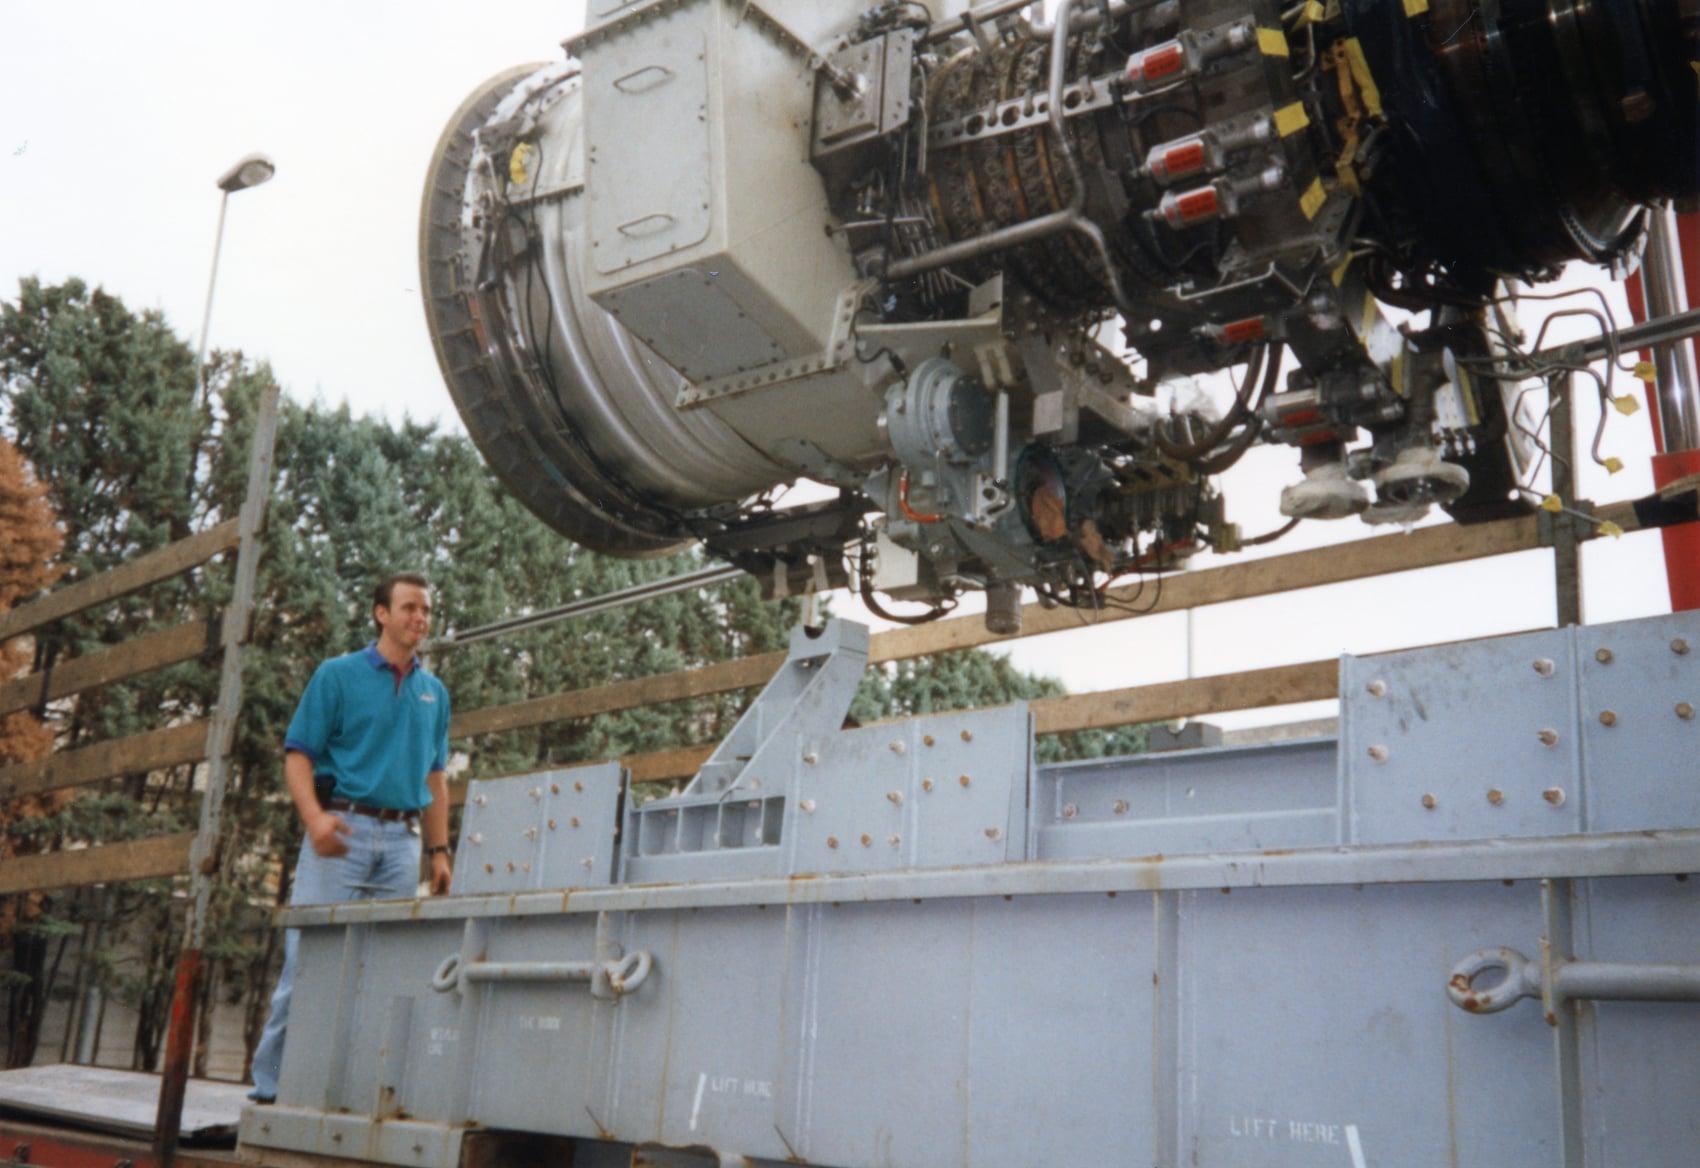 Joop-de-Jong-Vliegtuigmotor-laden-Fa-Sontel-Porcari-19-6-1997-17-ton-van-8-tot-17-uur-(5)